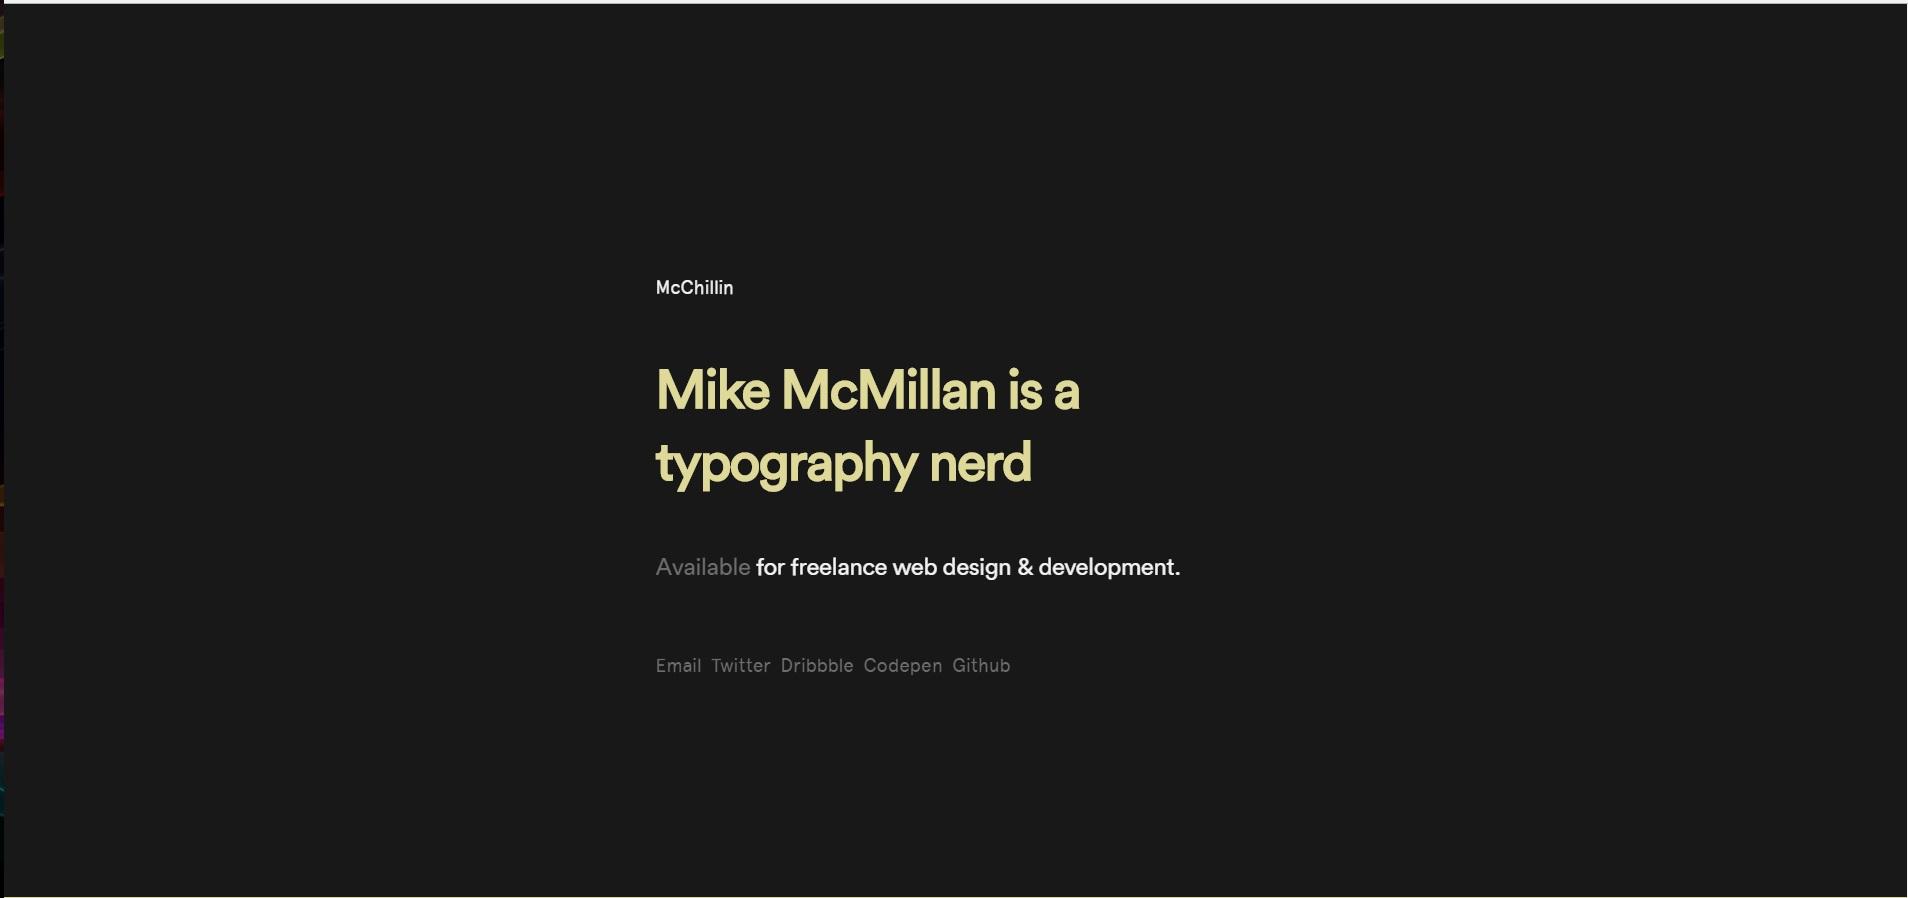 trendy web design 2018 - typografia 2